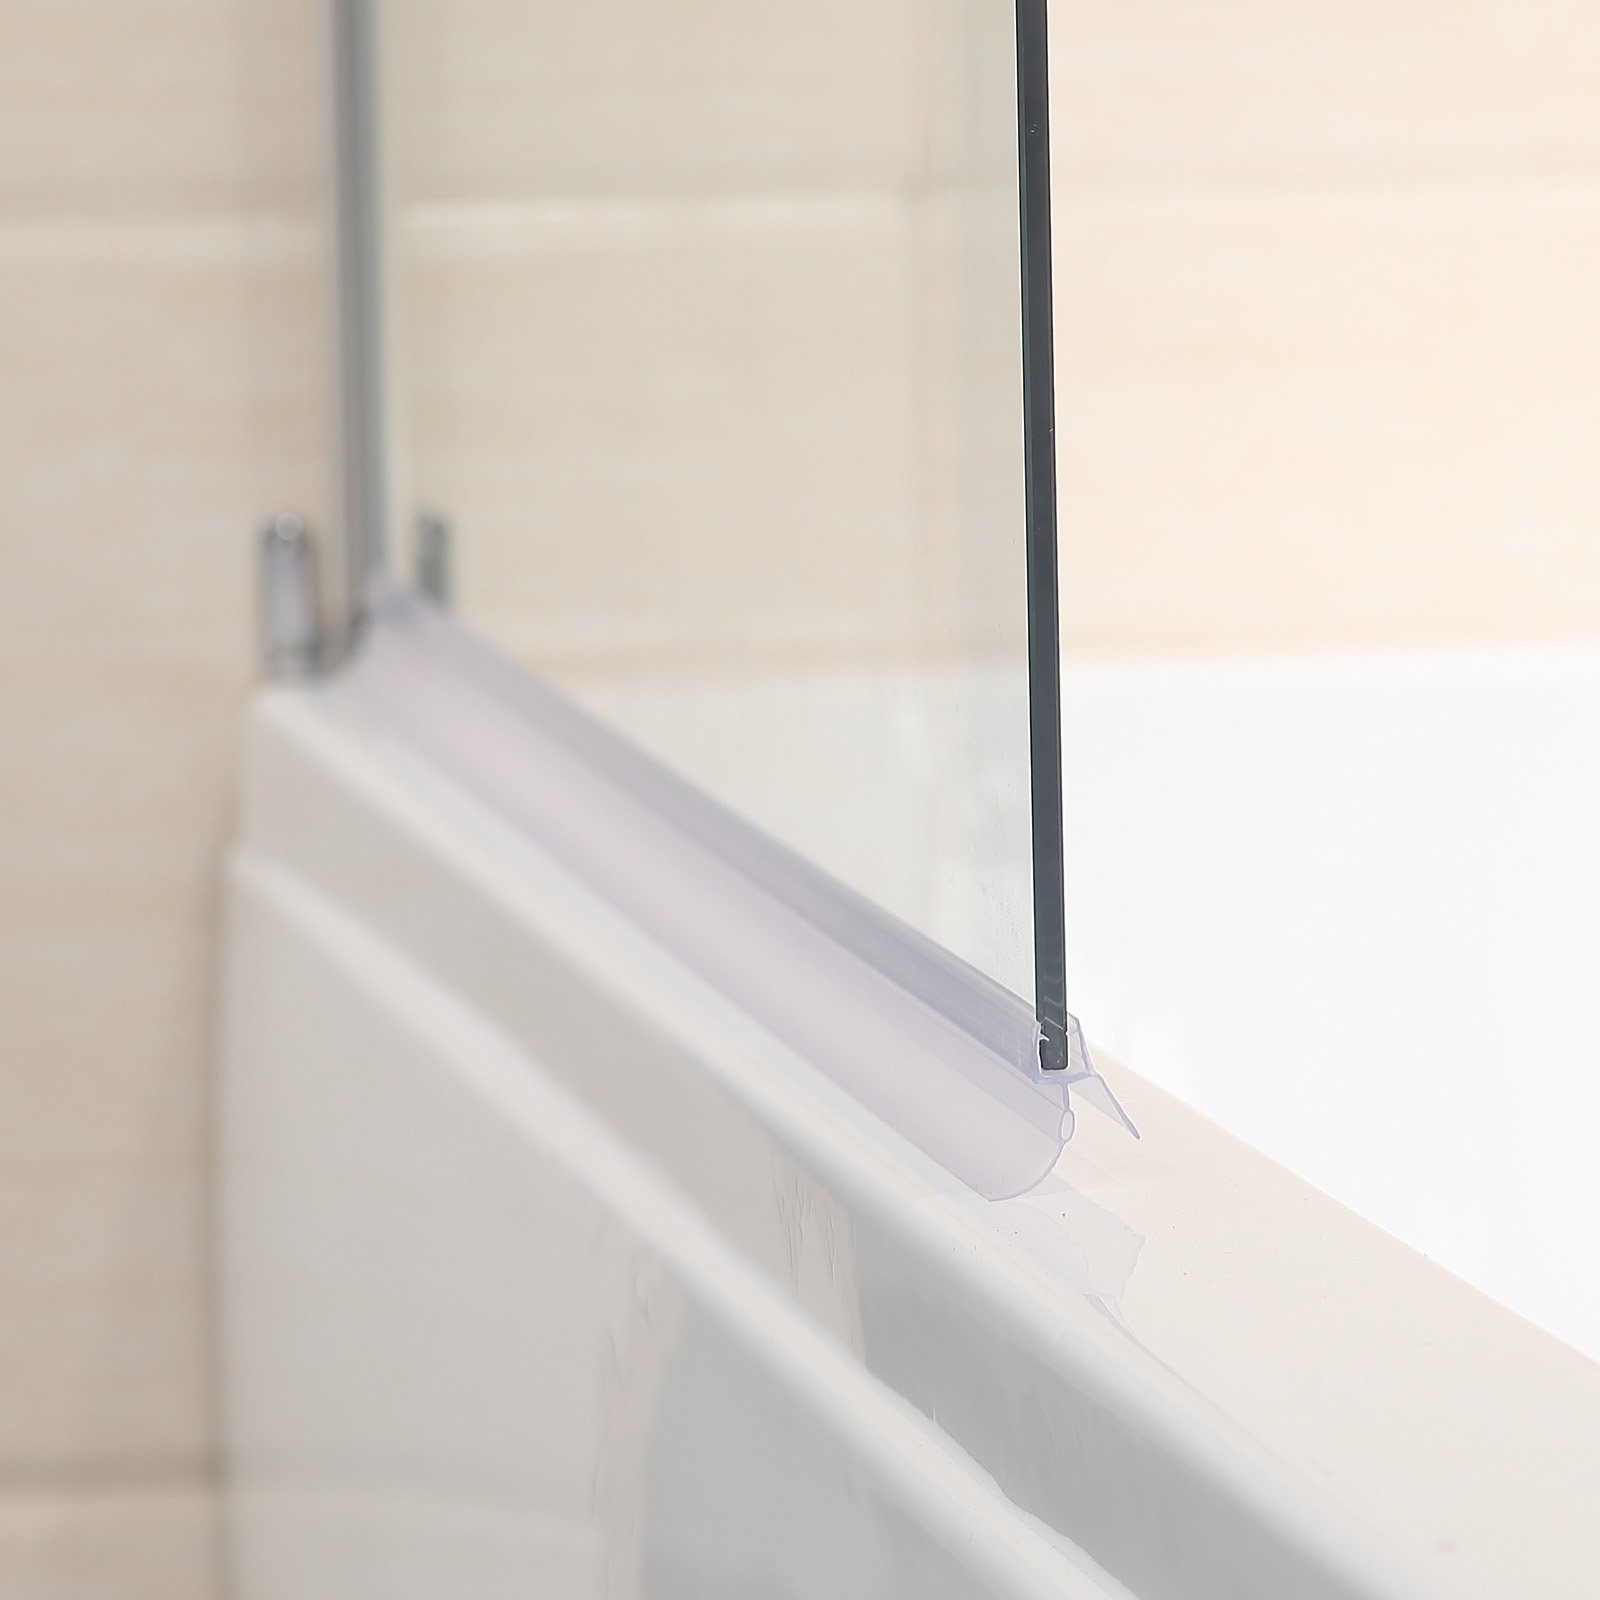 Mecor 55''X31'' Bathtub Shower Door 1/4'' Clear Glass Hinged Pivot Radius Frameless Chrome Finish by mecor (Image #5)